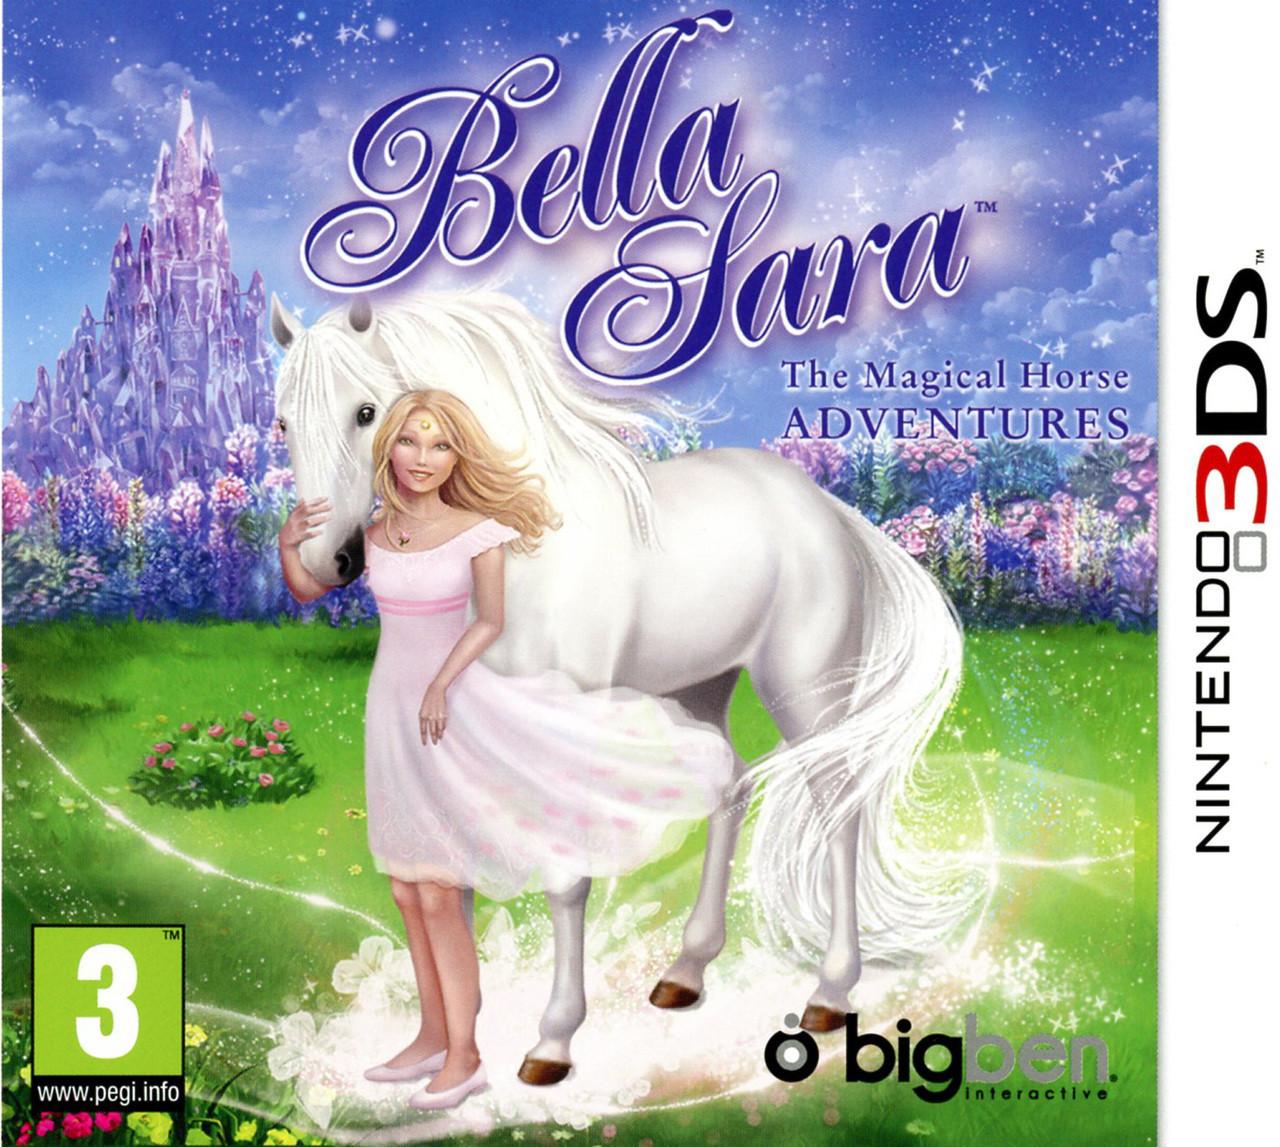 Bella sara the magical horse adventures sur nintendo 3ds - Jeux de bella sara ...